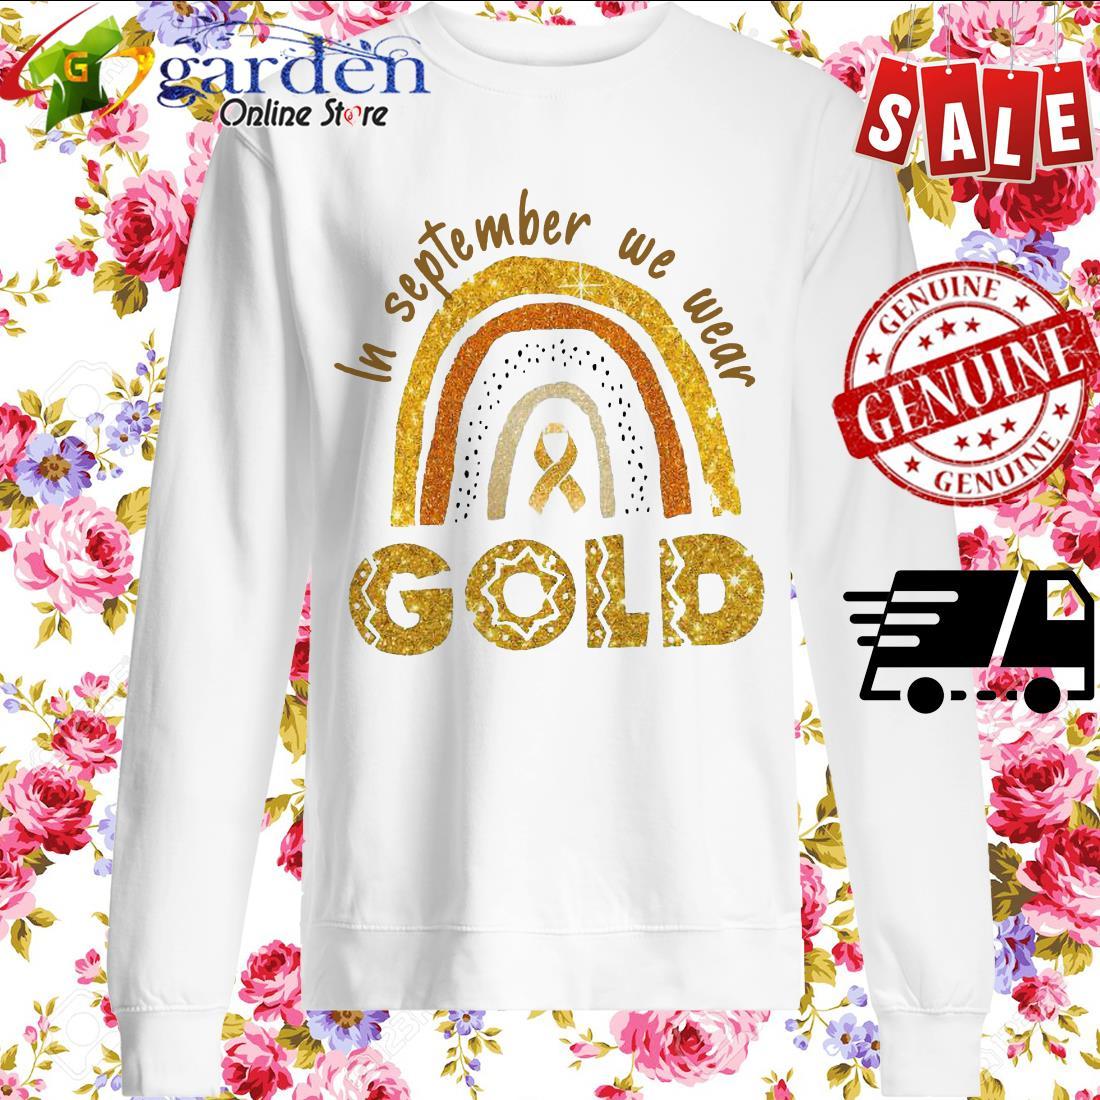 In September We Wear Gold sweater